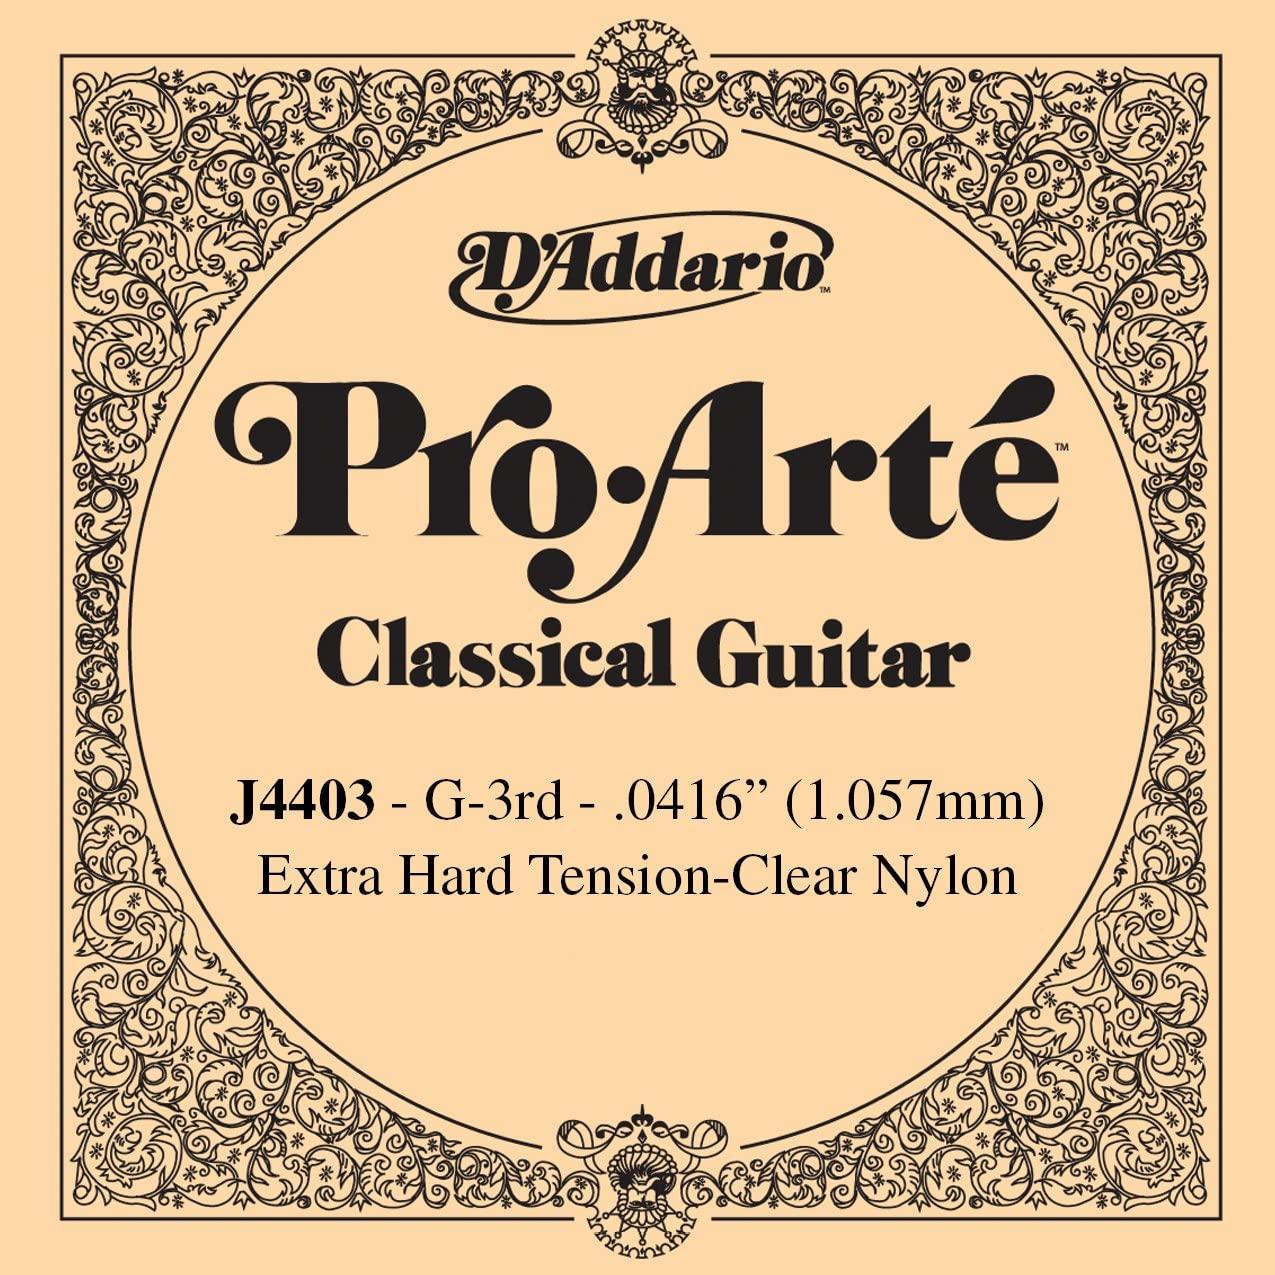 D'Addario J4403 Pro-Arte Nylon Classical Guitar Single String, Extra-Hard Tension, Third String